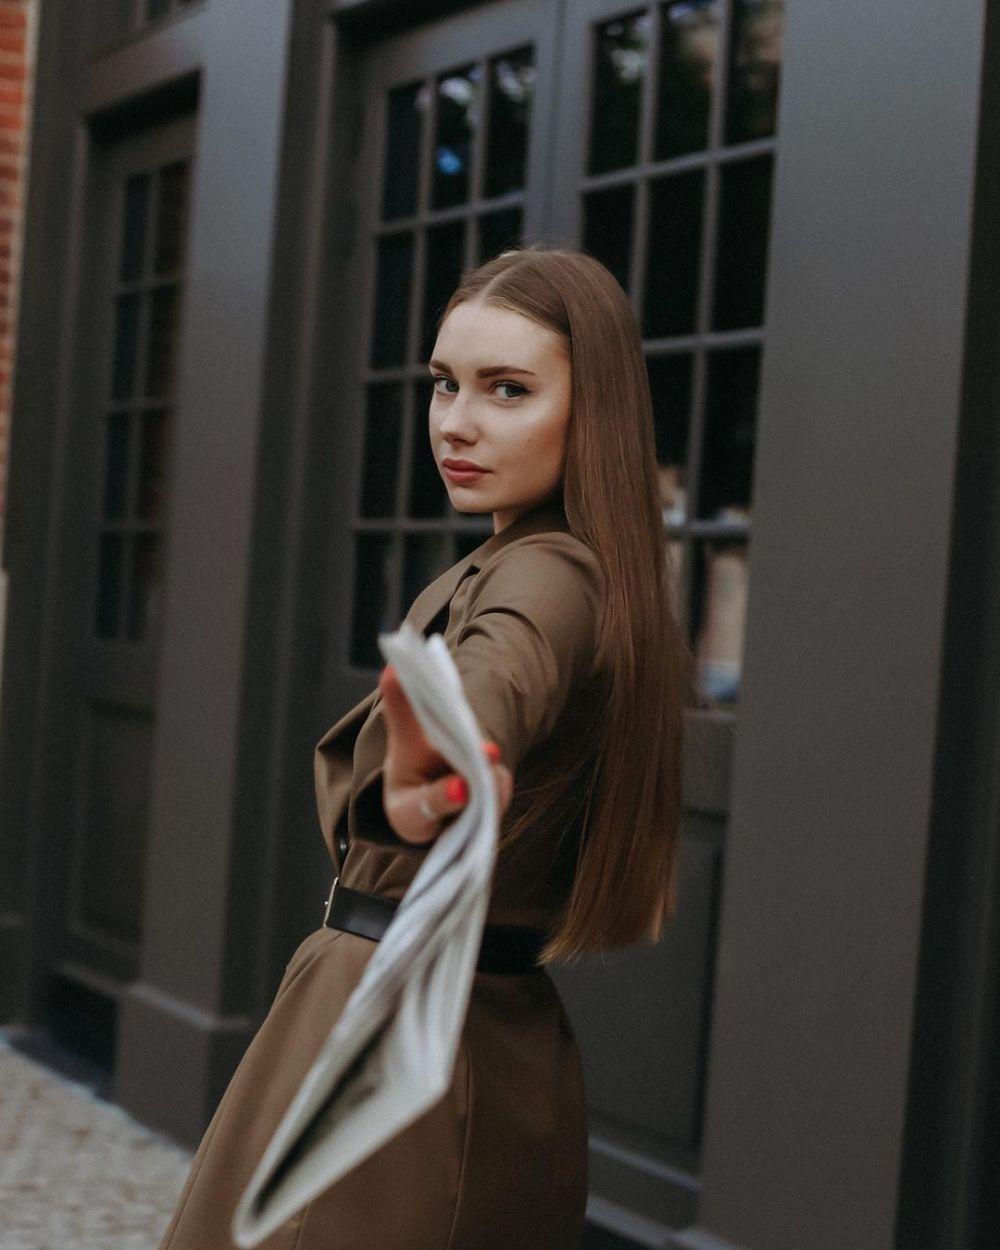 Полевикова Маргарита, 23 года, 168 см, Санкт-Петербург. Банк «Санкт-Петербург», финансовый эксперт. Хобби: танцы.